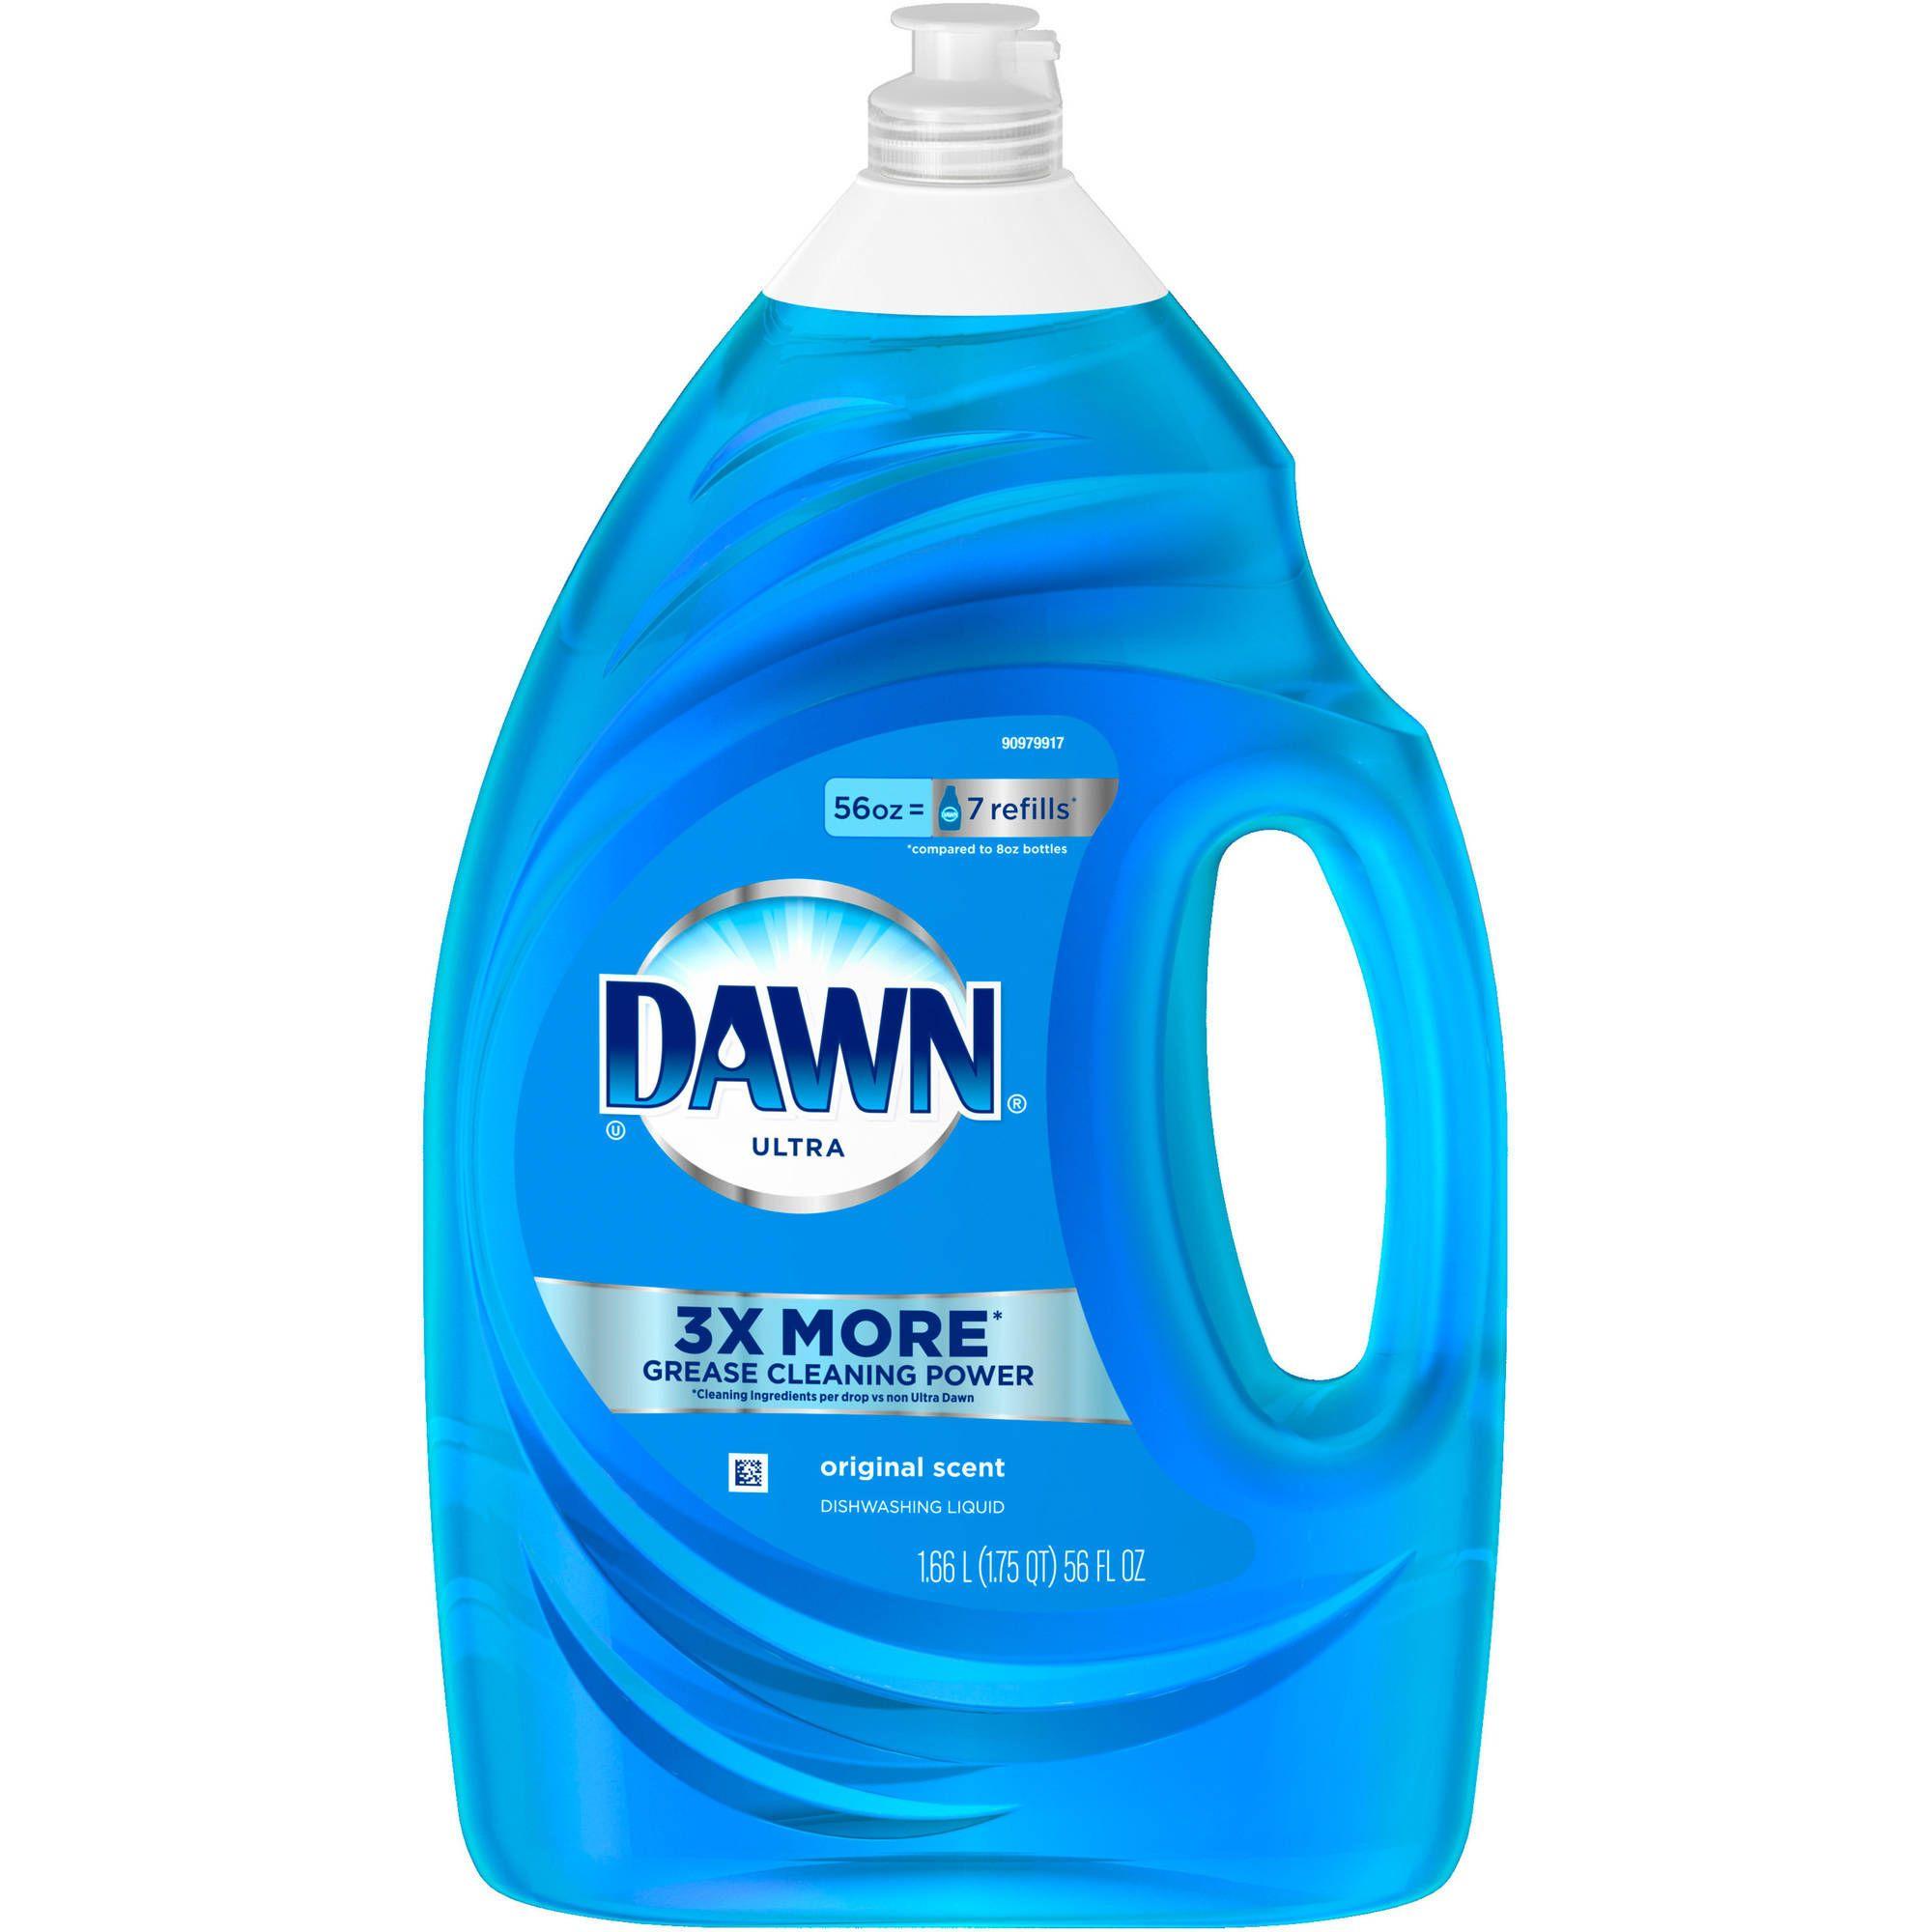 Dawn Ultra Dishwashing Liquid Original Scent Choose Your